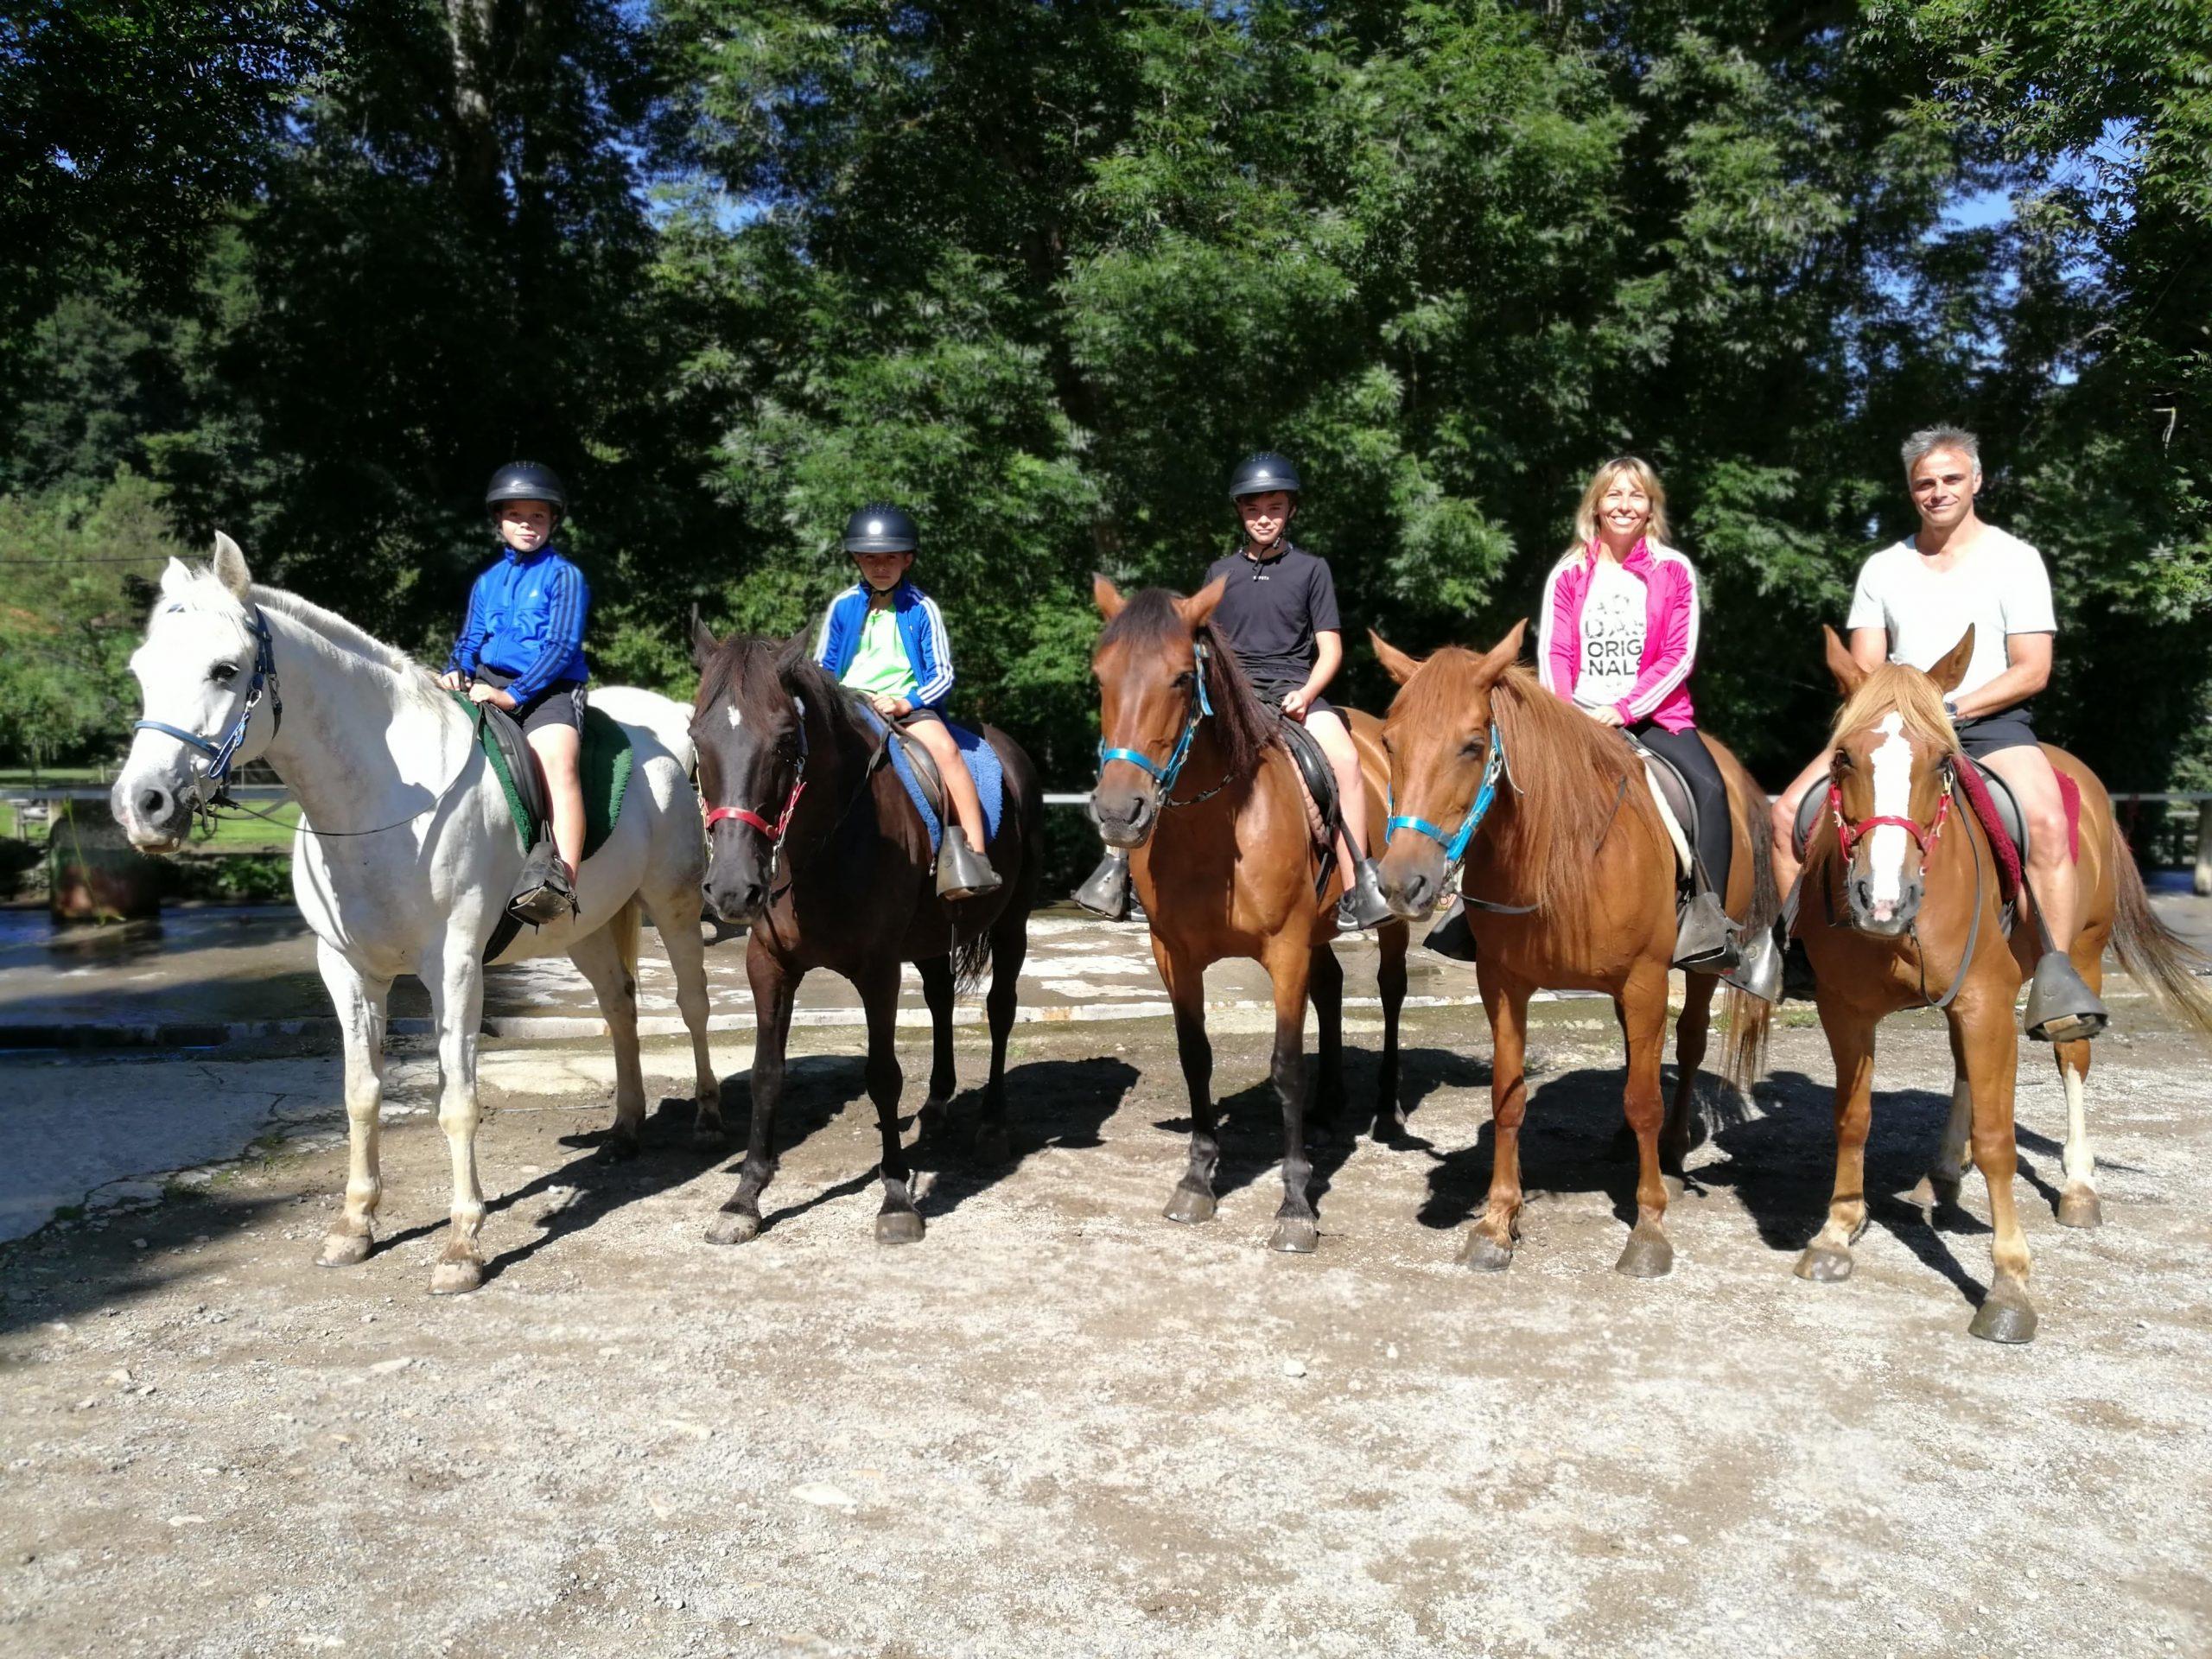 a caballo en familia numerosa